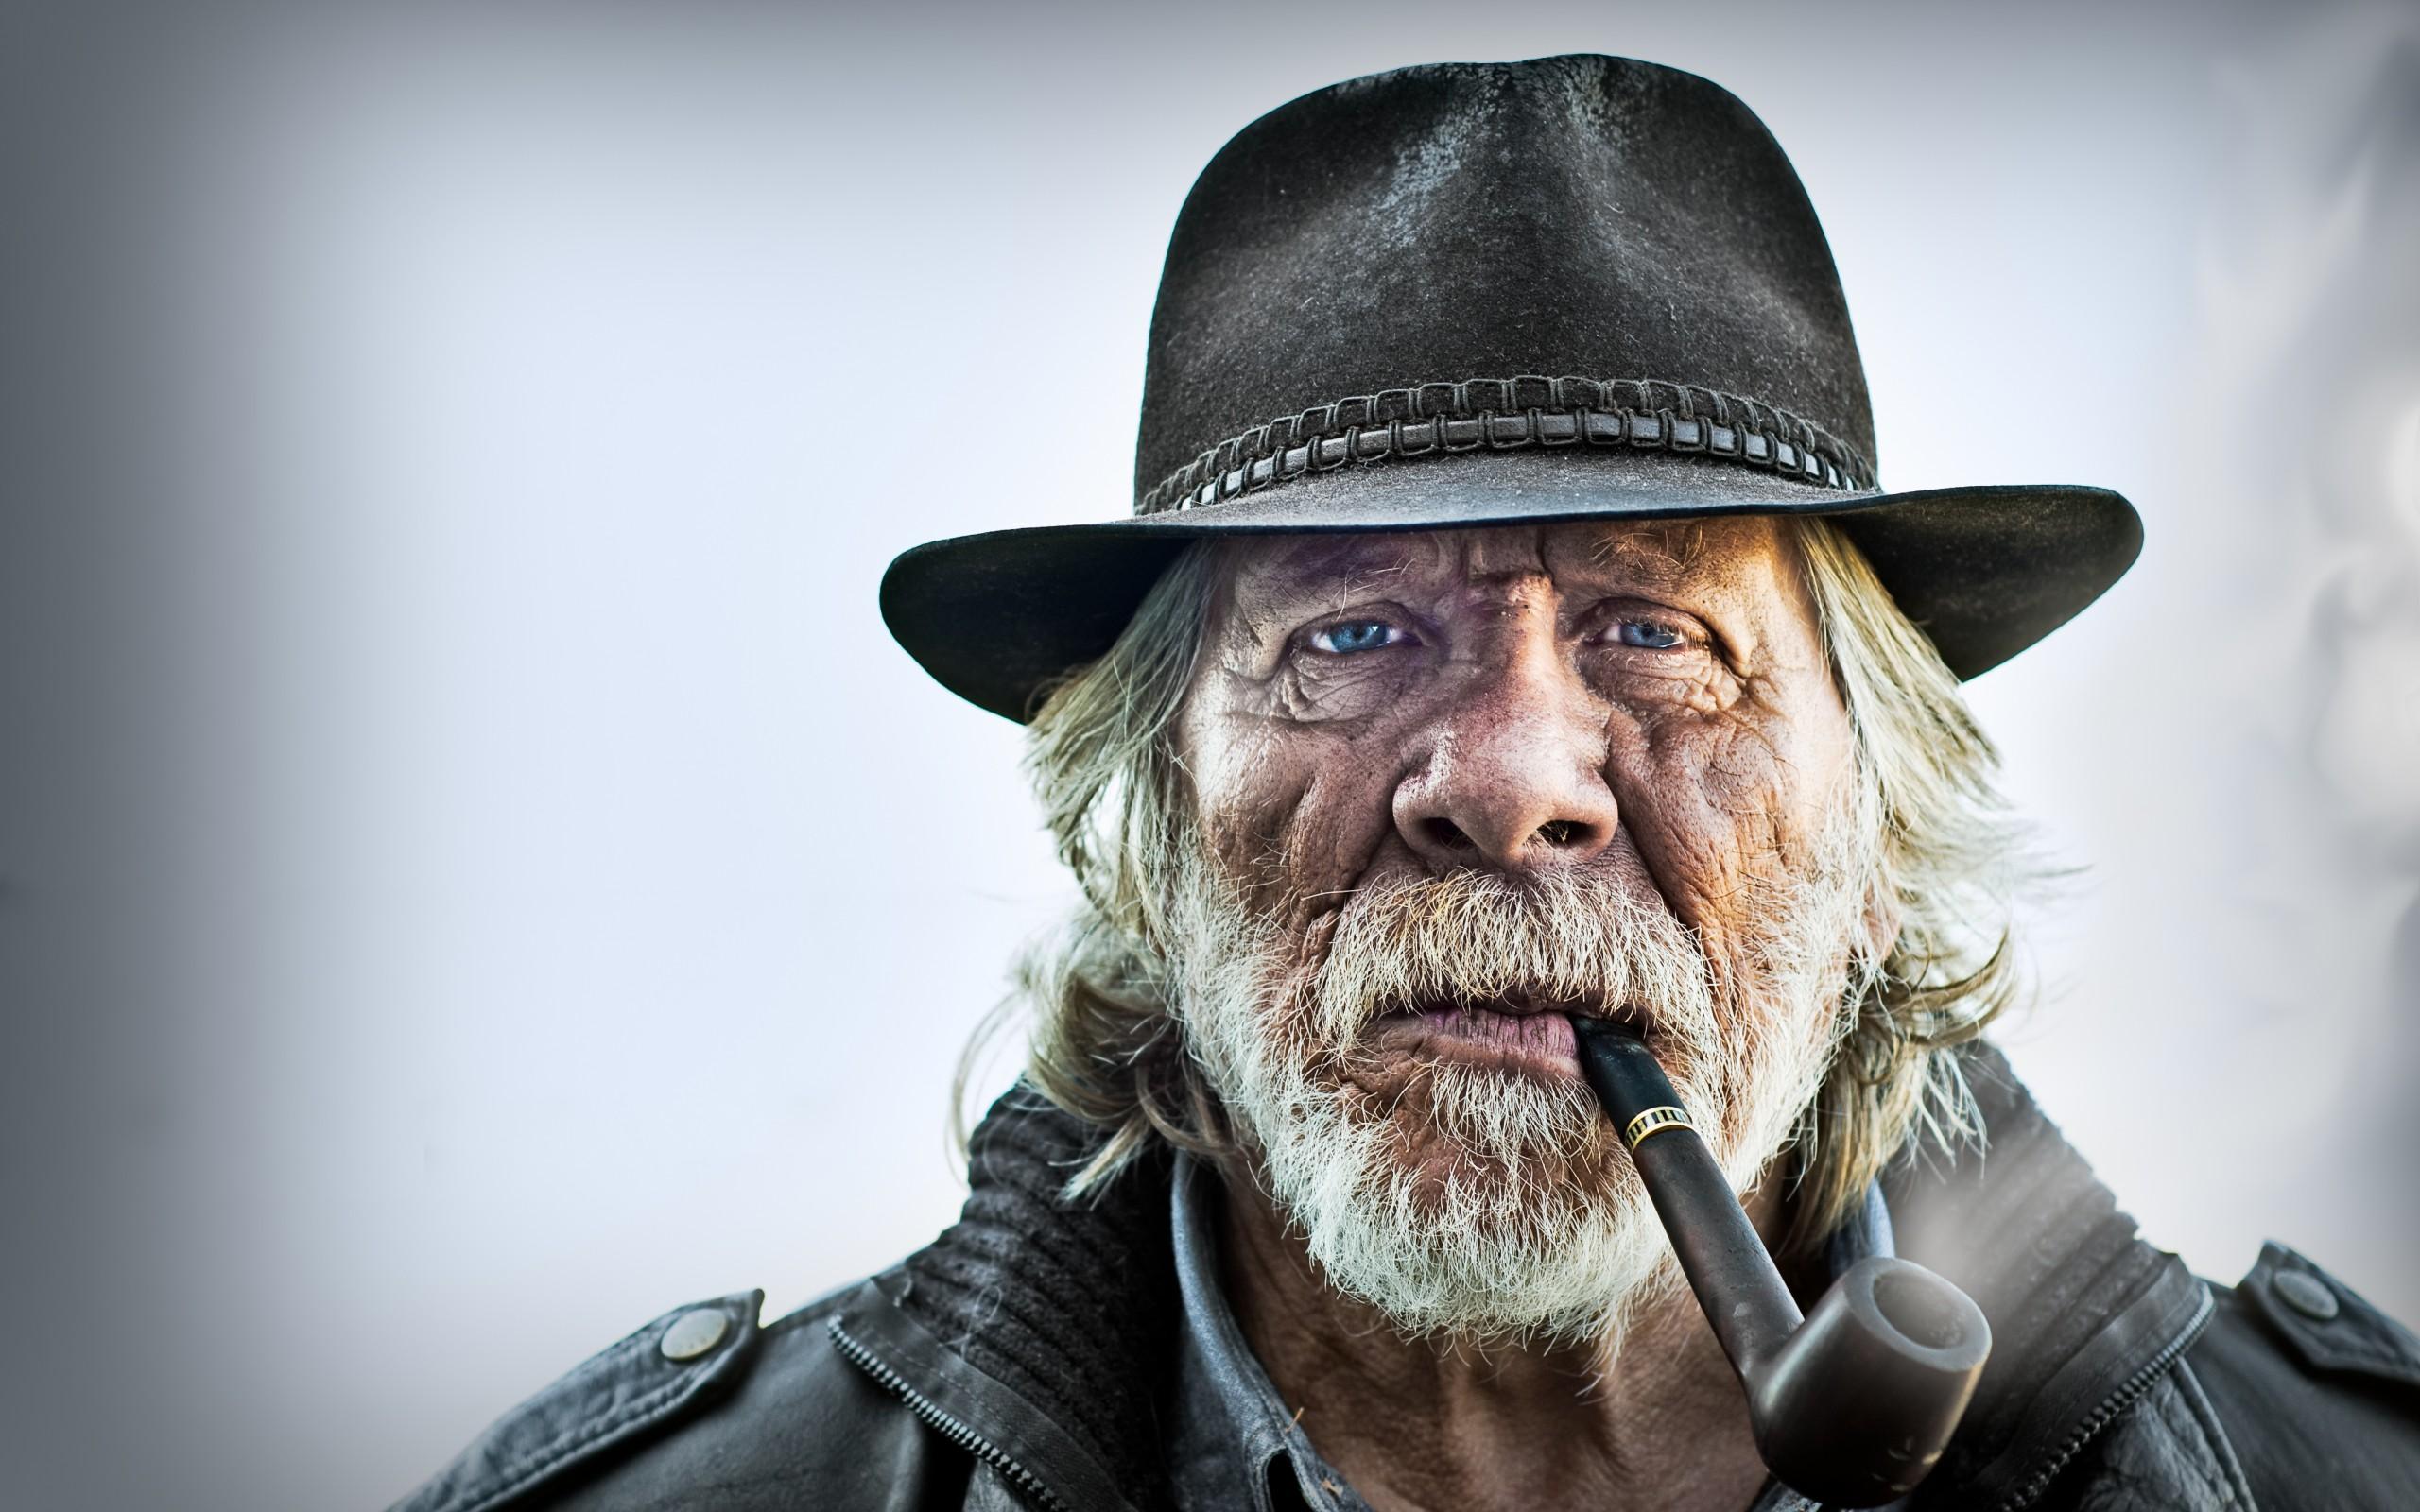 портрет старика, трубка, борода